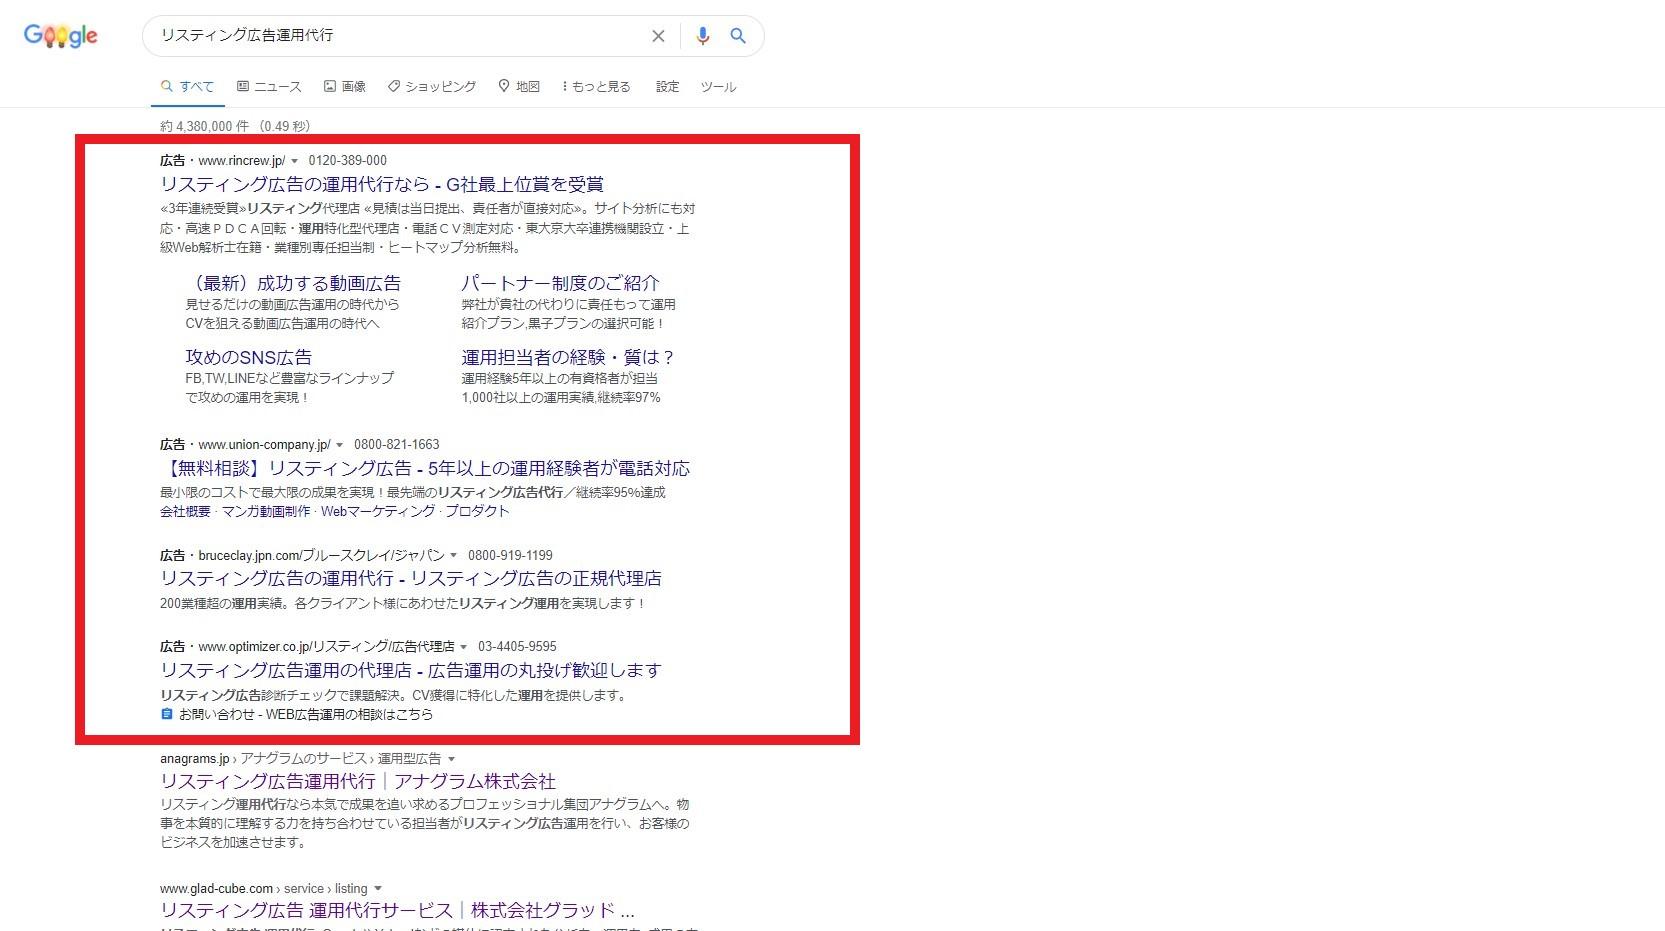 Google広告のリスティング広告掲載結果